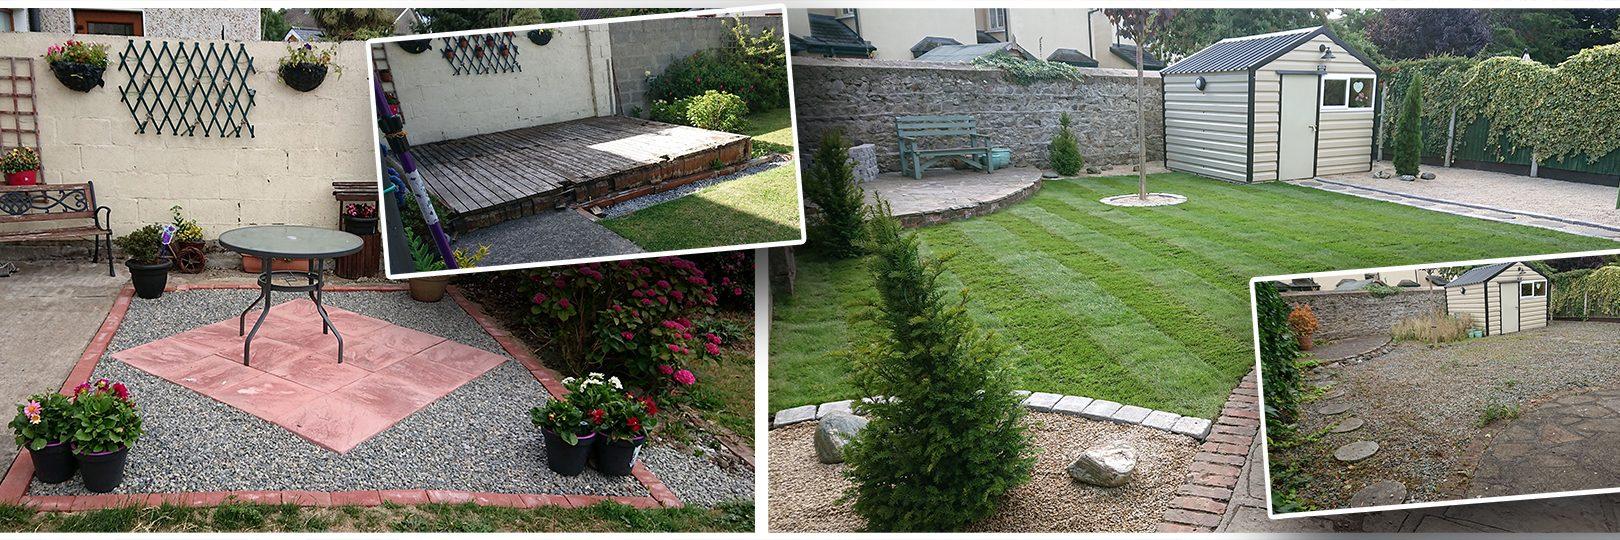 Garden Solutions | Local Gardening Services | Kildare